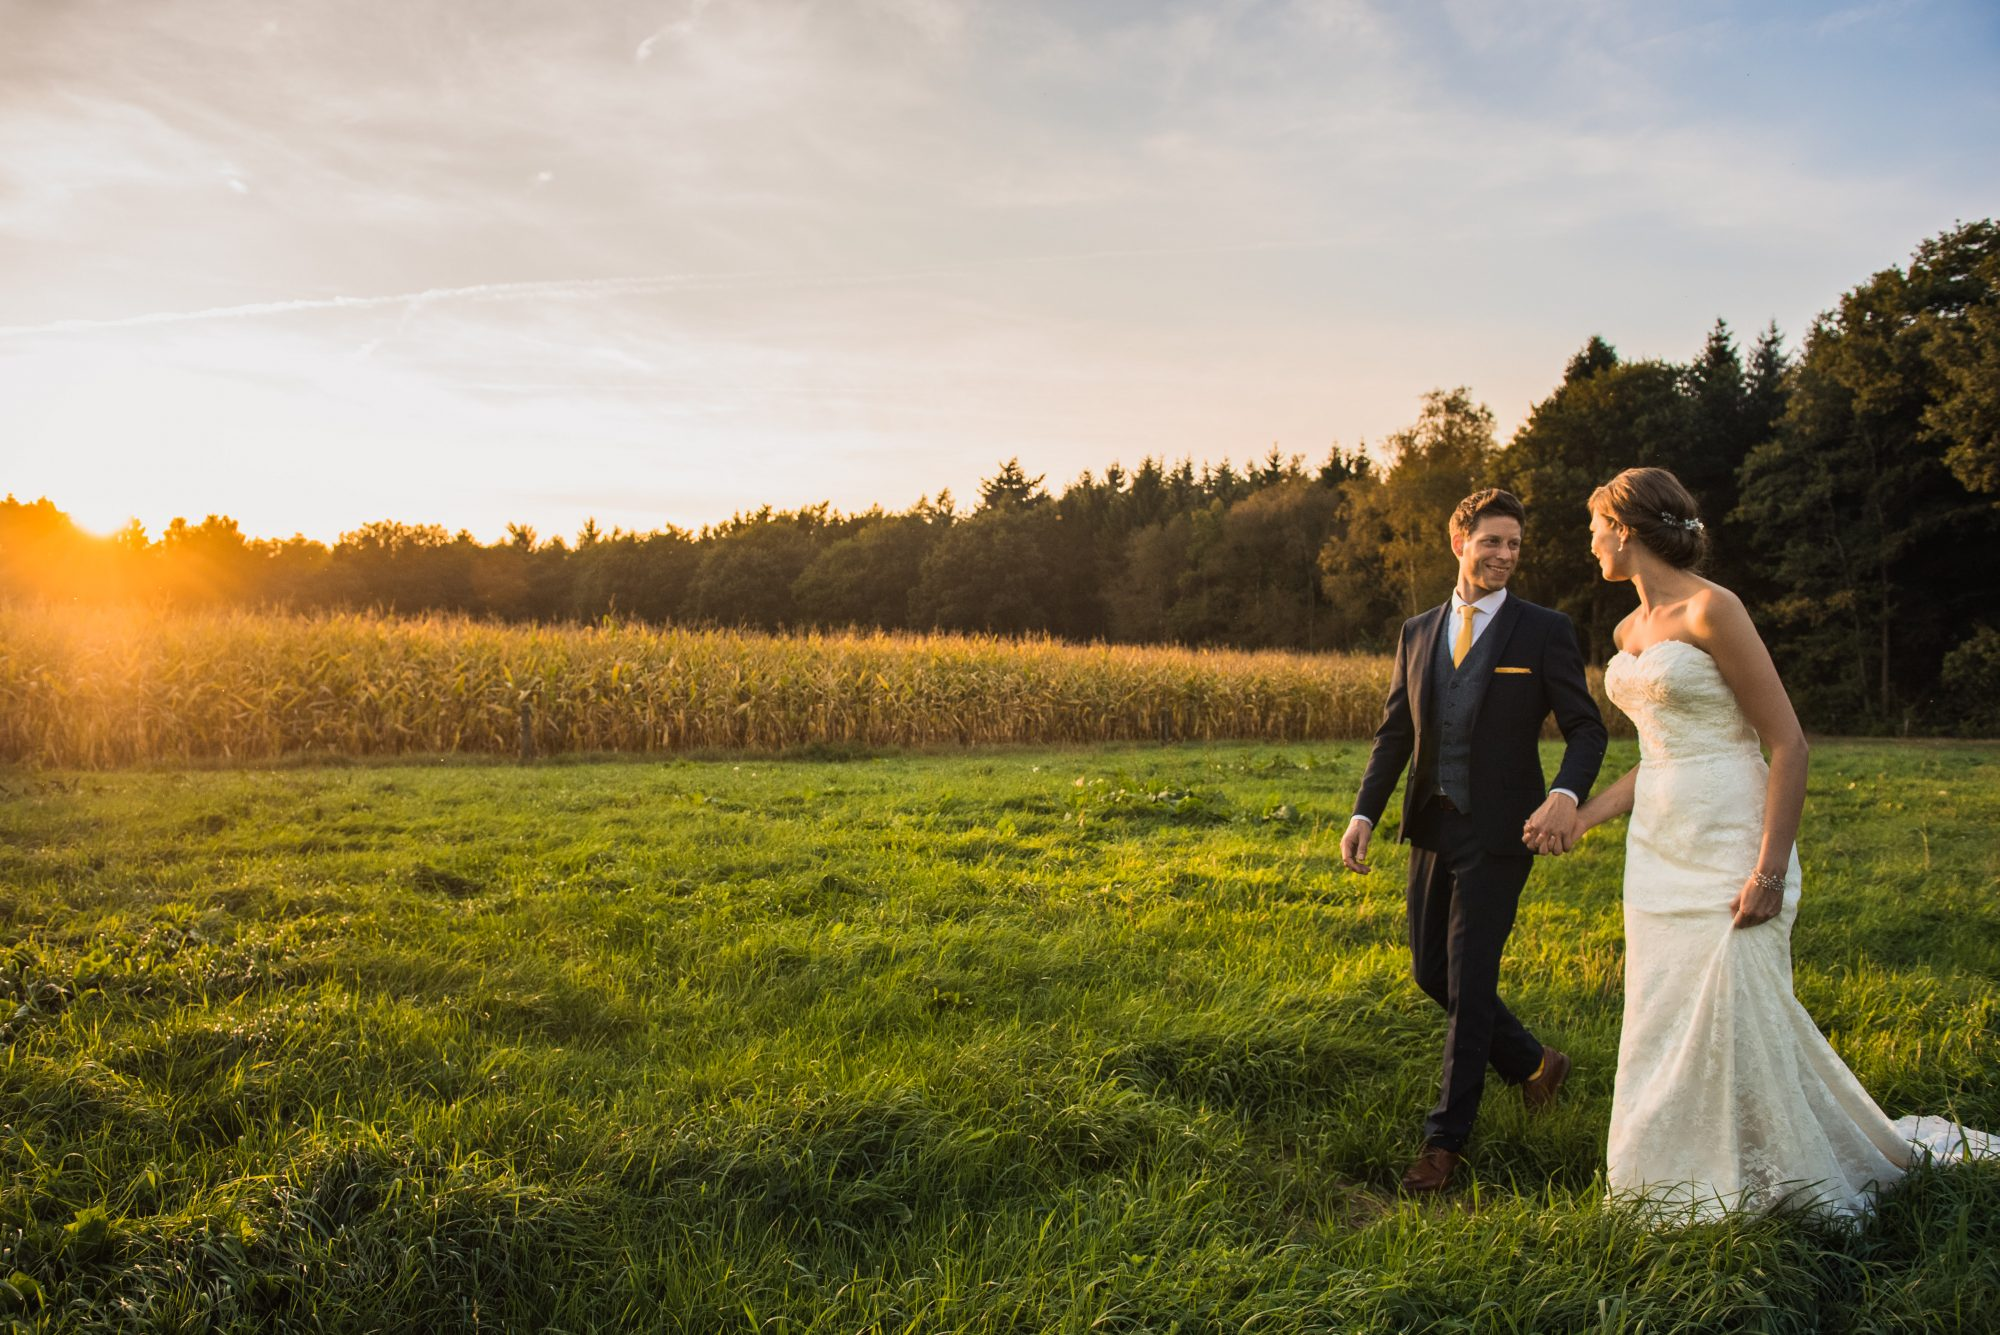 bruiloft-roland-annewil-674